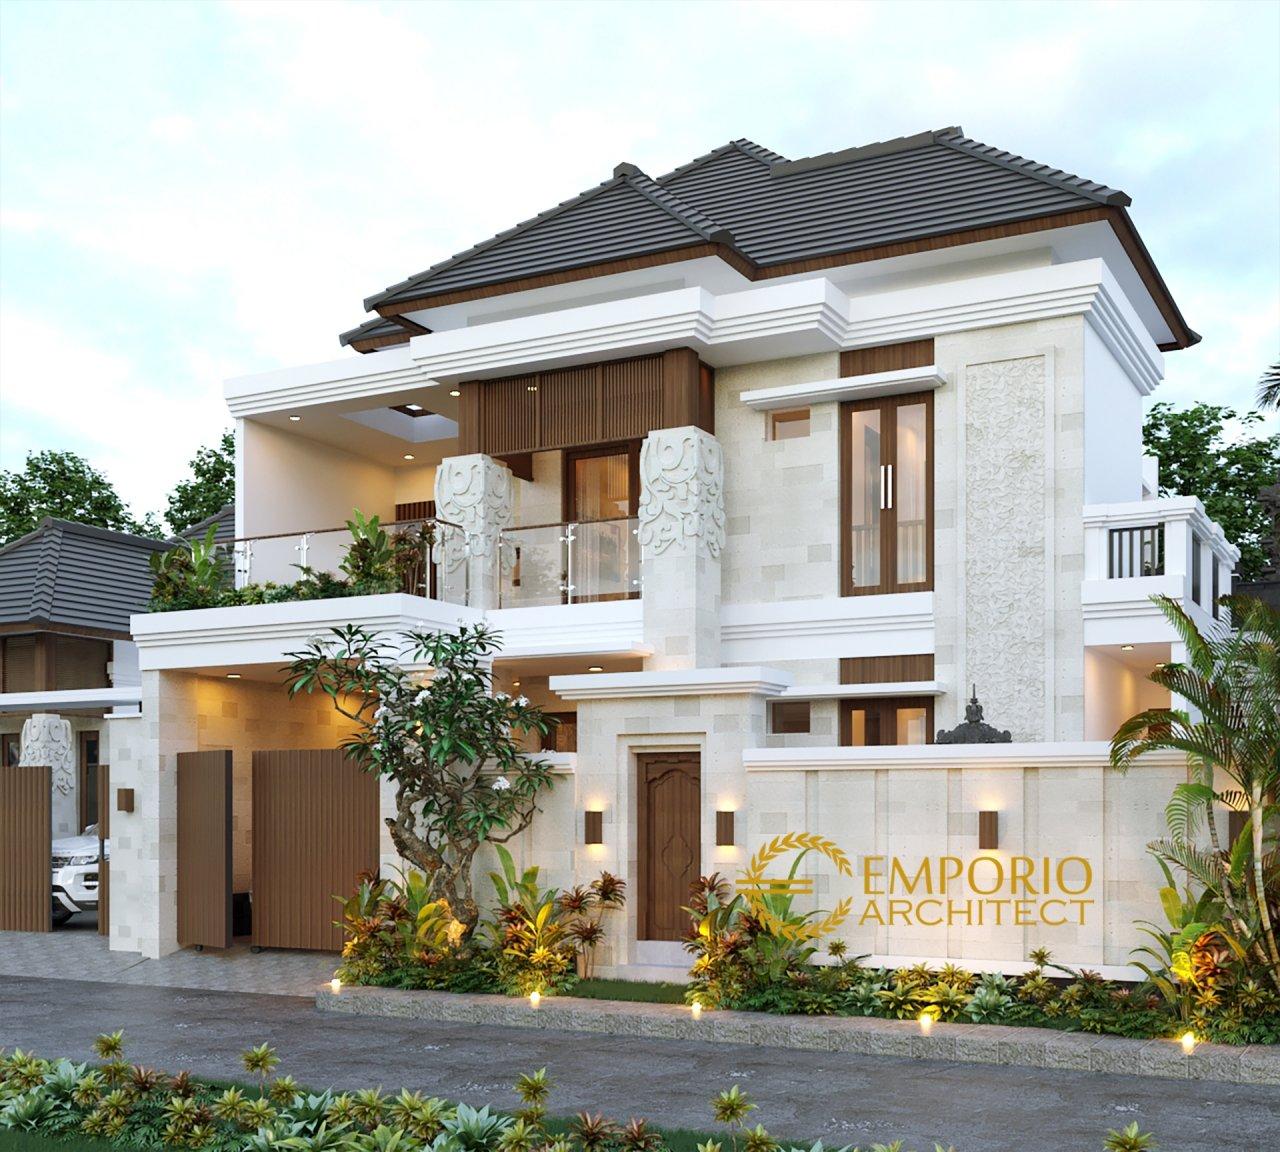 Desain Rumah Villa Bali 2 Lantai Bapak Ketut Berana Di